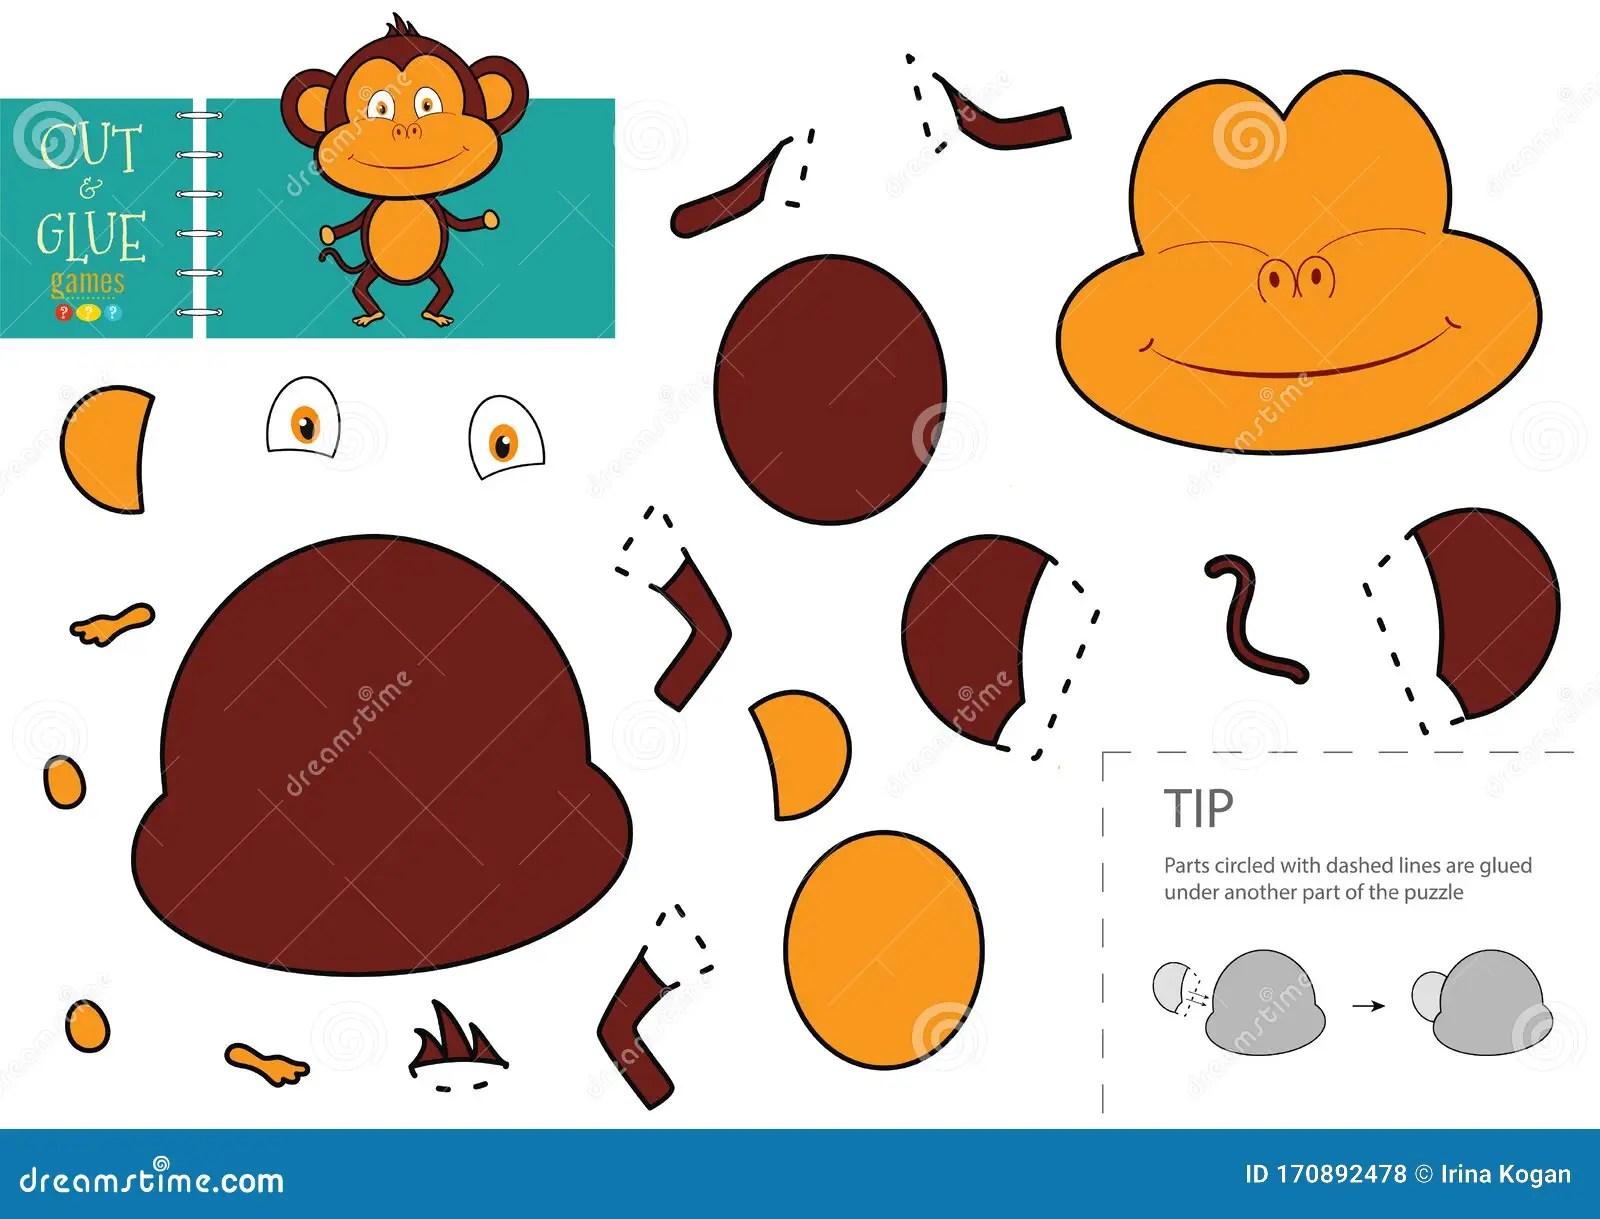 Cut And Glue Paper Toy Preschool Kids Vector Educational